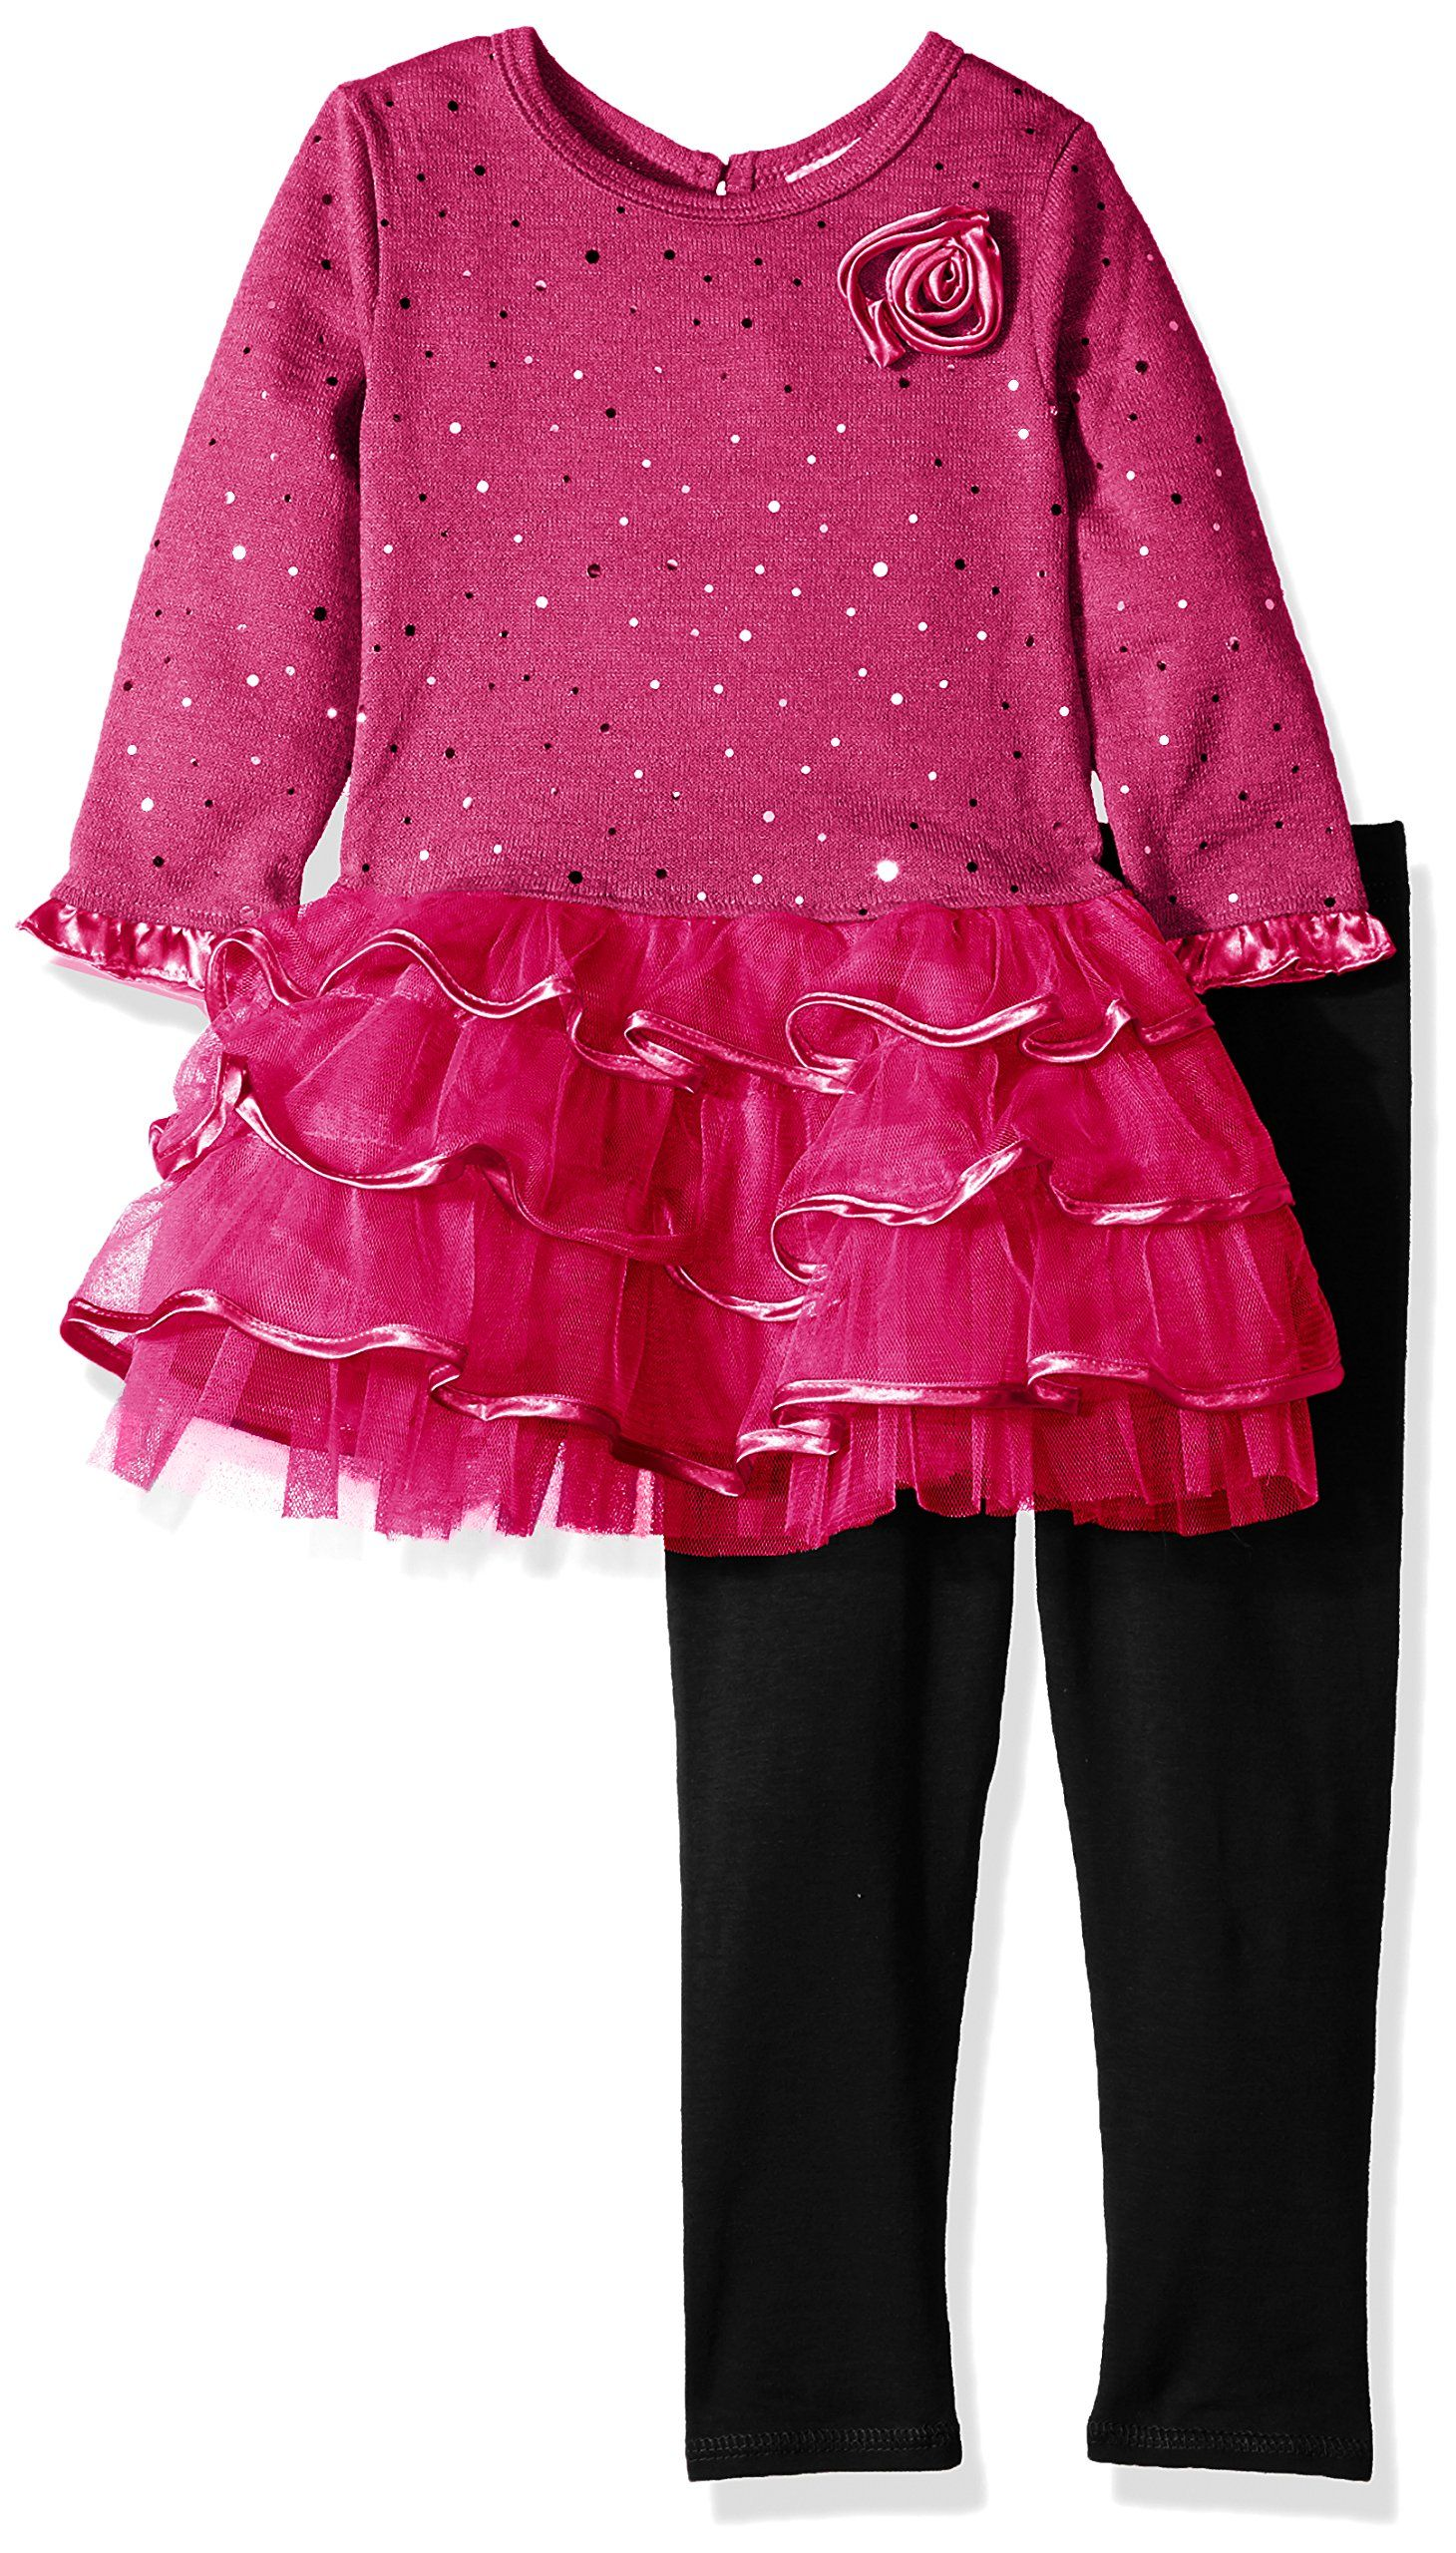 Youngland Girls' Sparkle Brushed Sweater Knit and Mesh Tiered Dress, #Ad #Sparkle, #Brushed, #Youngland, #Girls